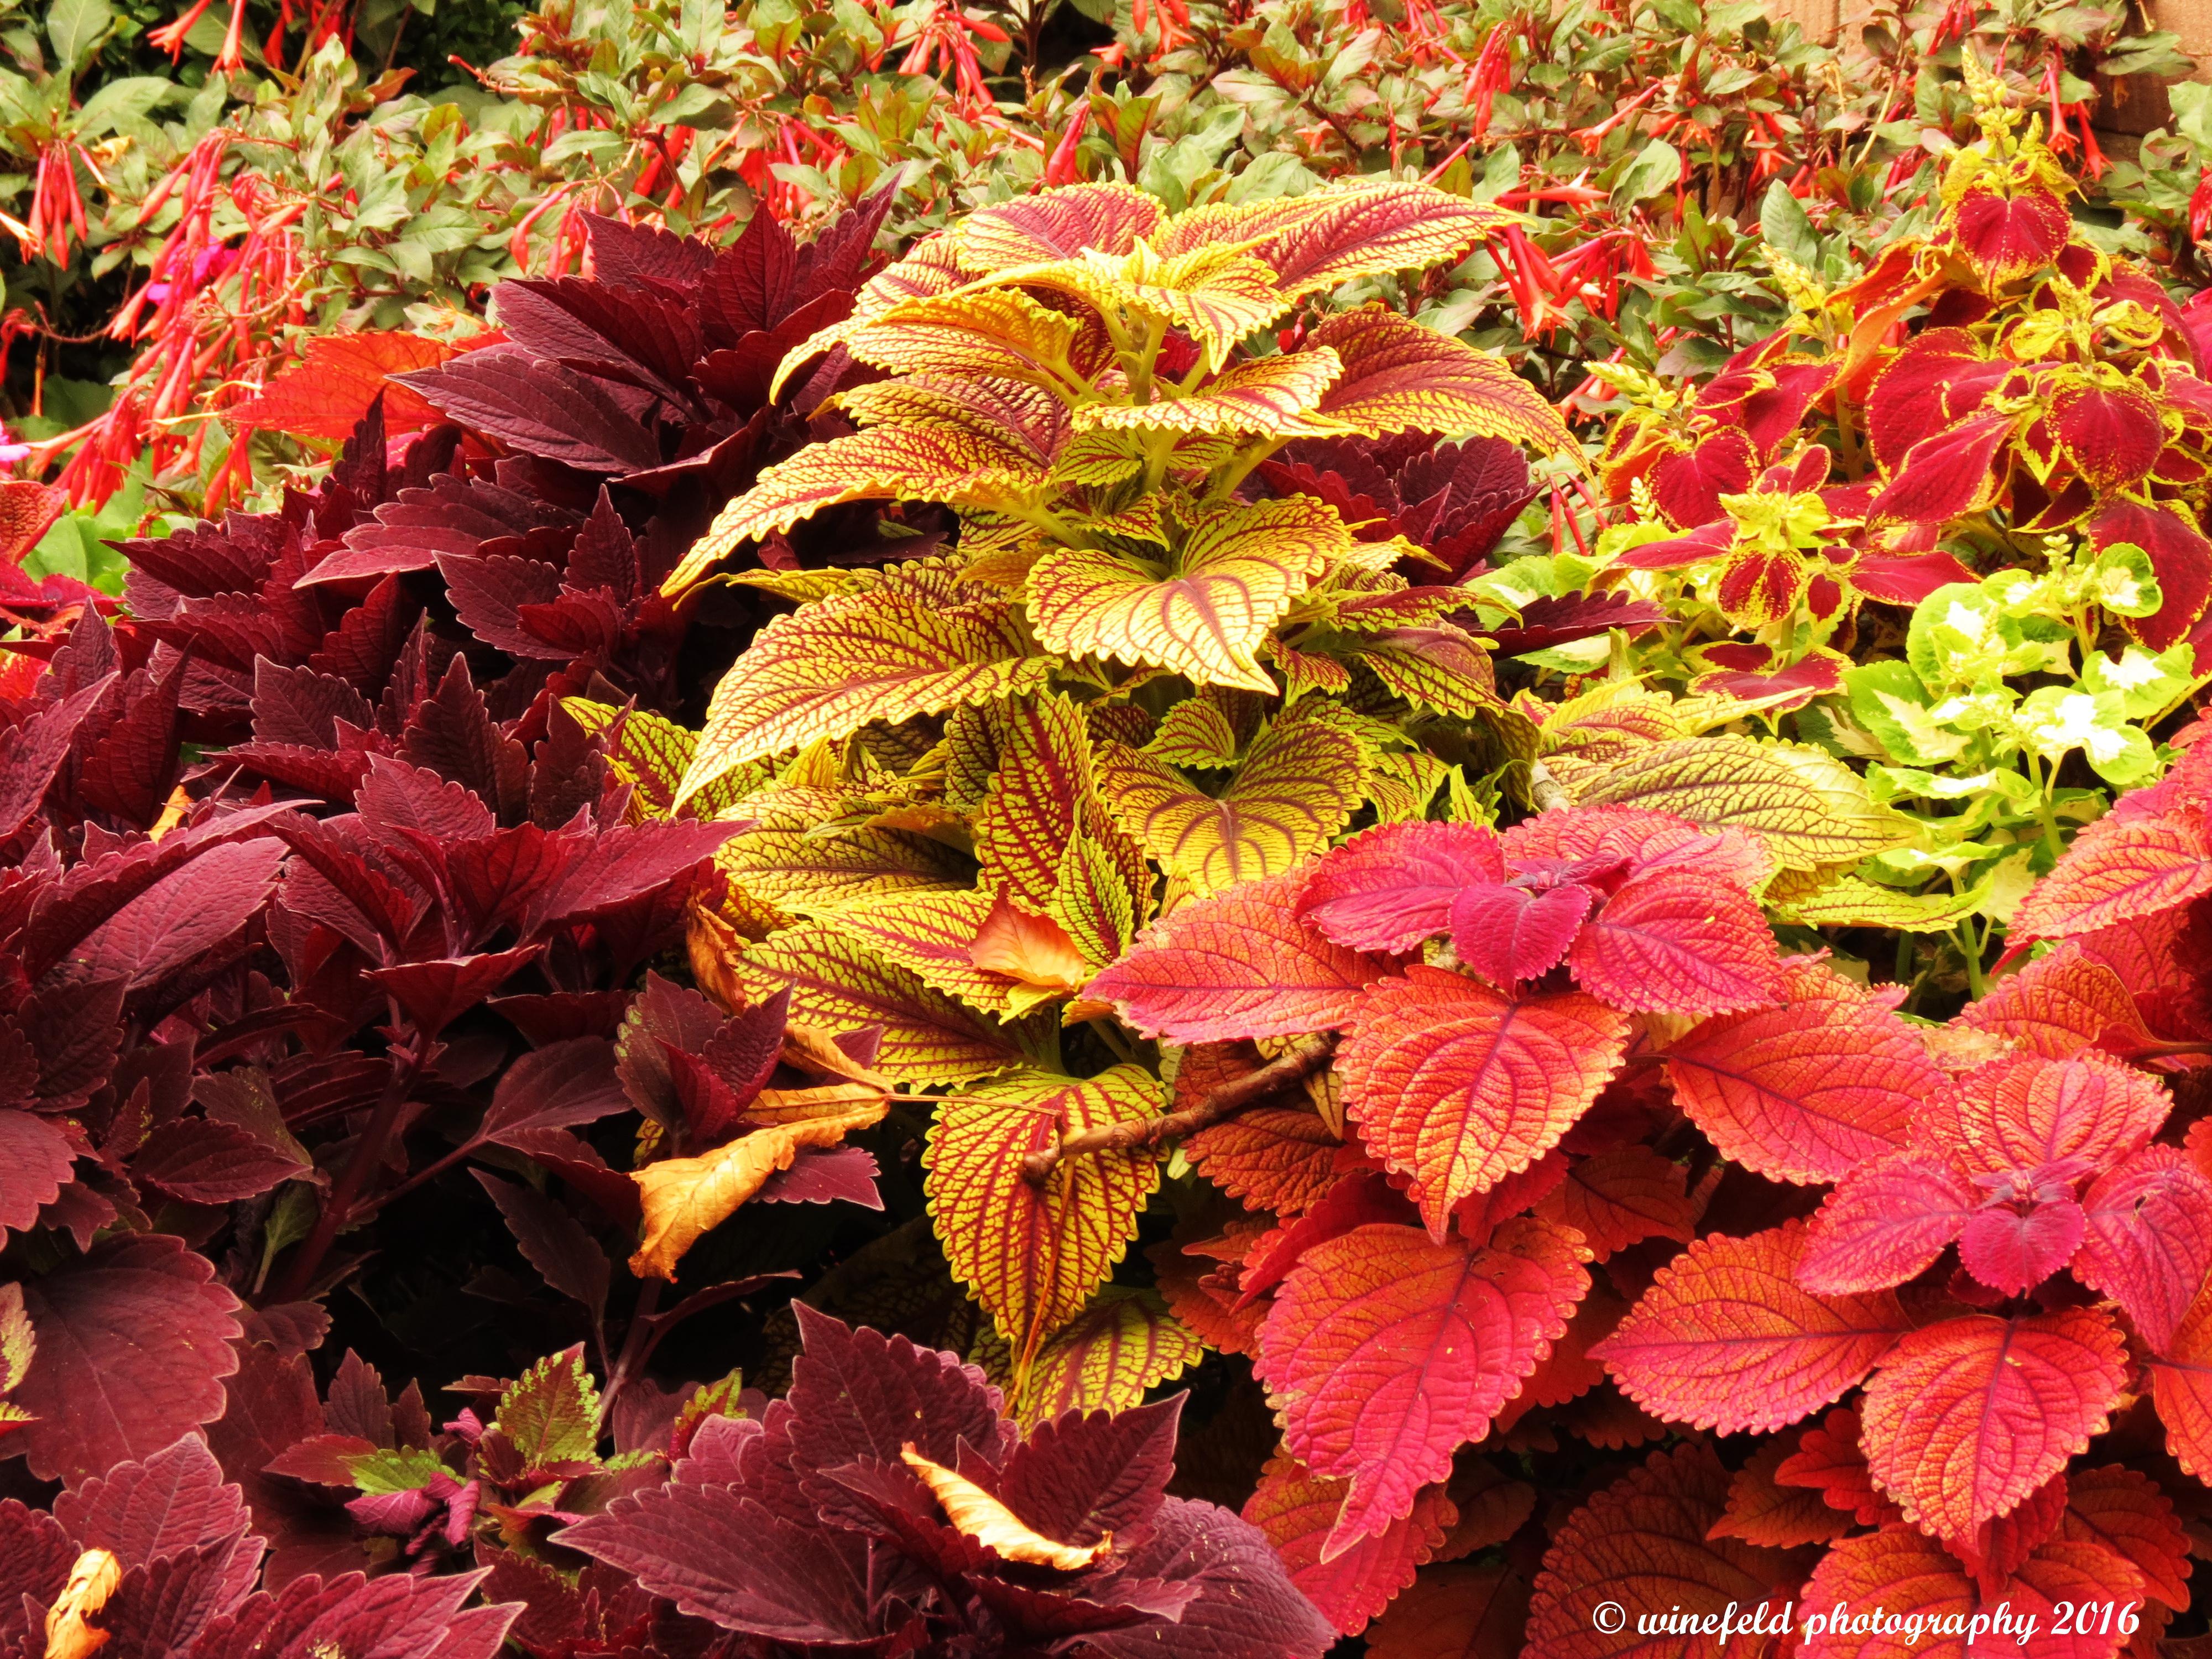 Pflanzen im herbst herbstdeko fur den garten herbst - Pflanzen fur den vorgarten ...